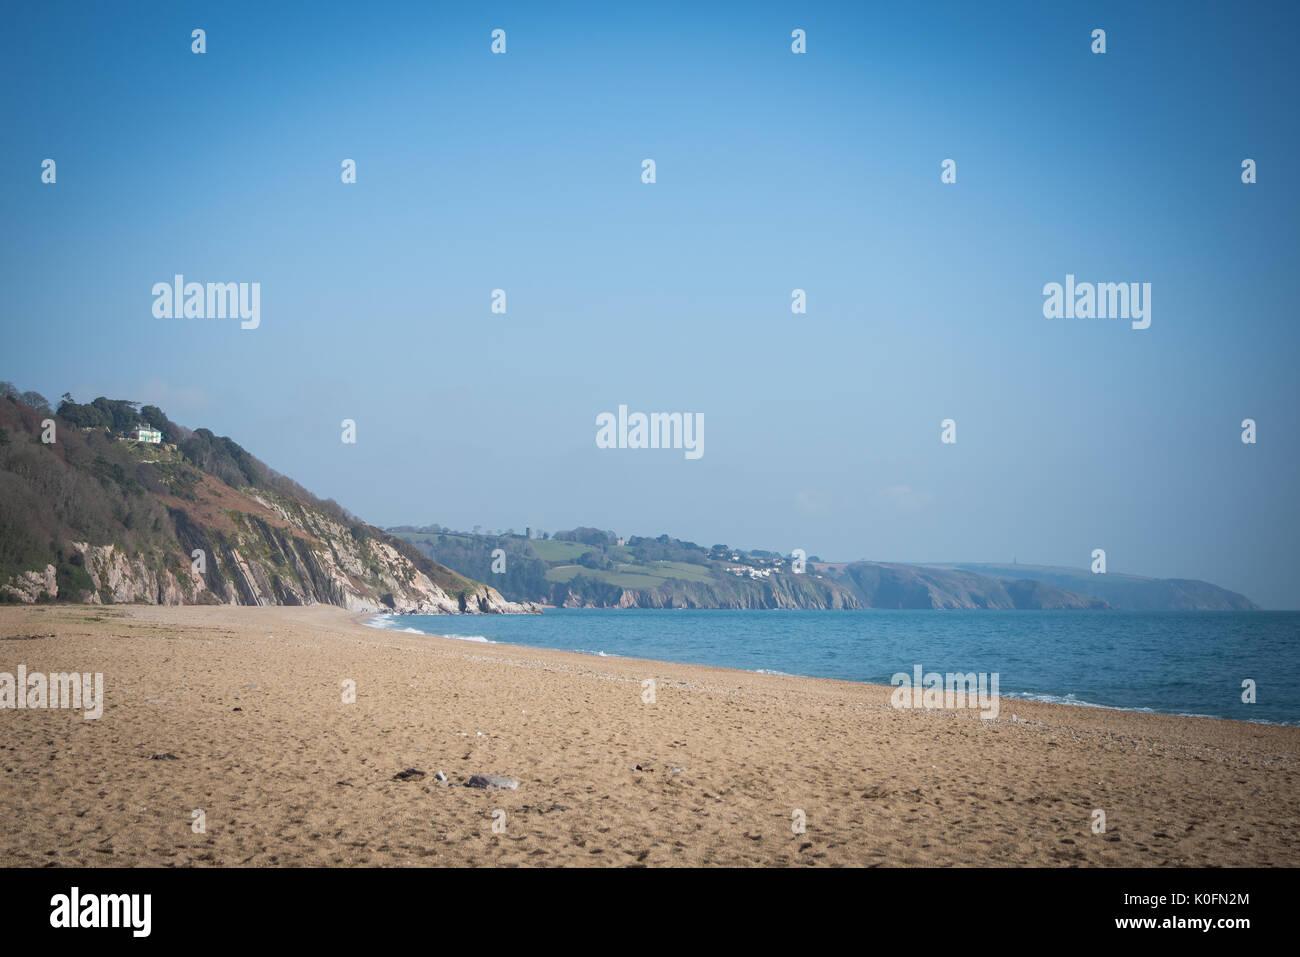 Slapton sands on a cloudless summer sky. - Stock Image